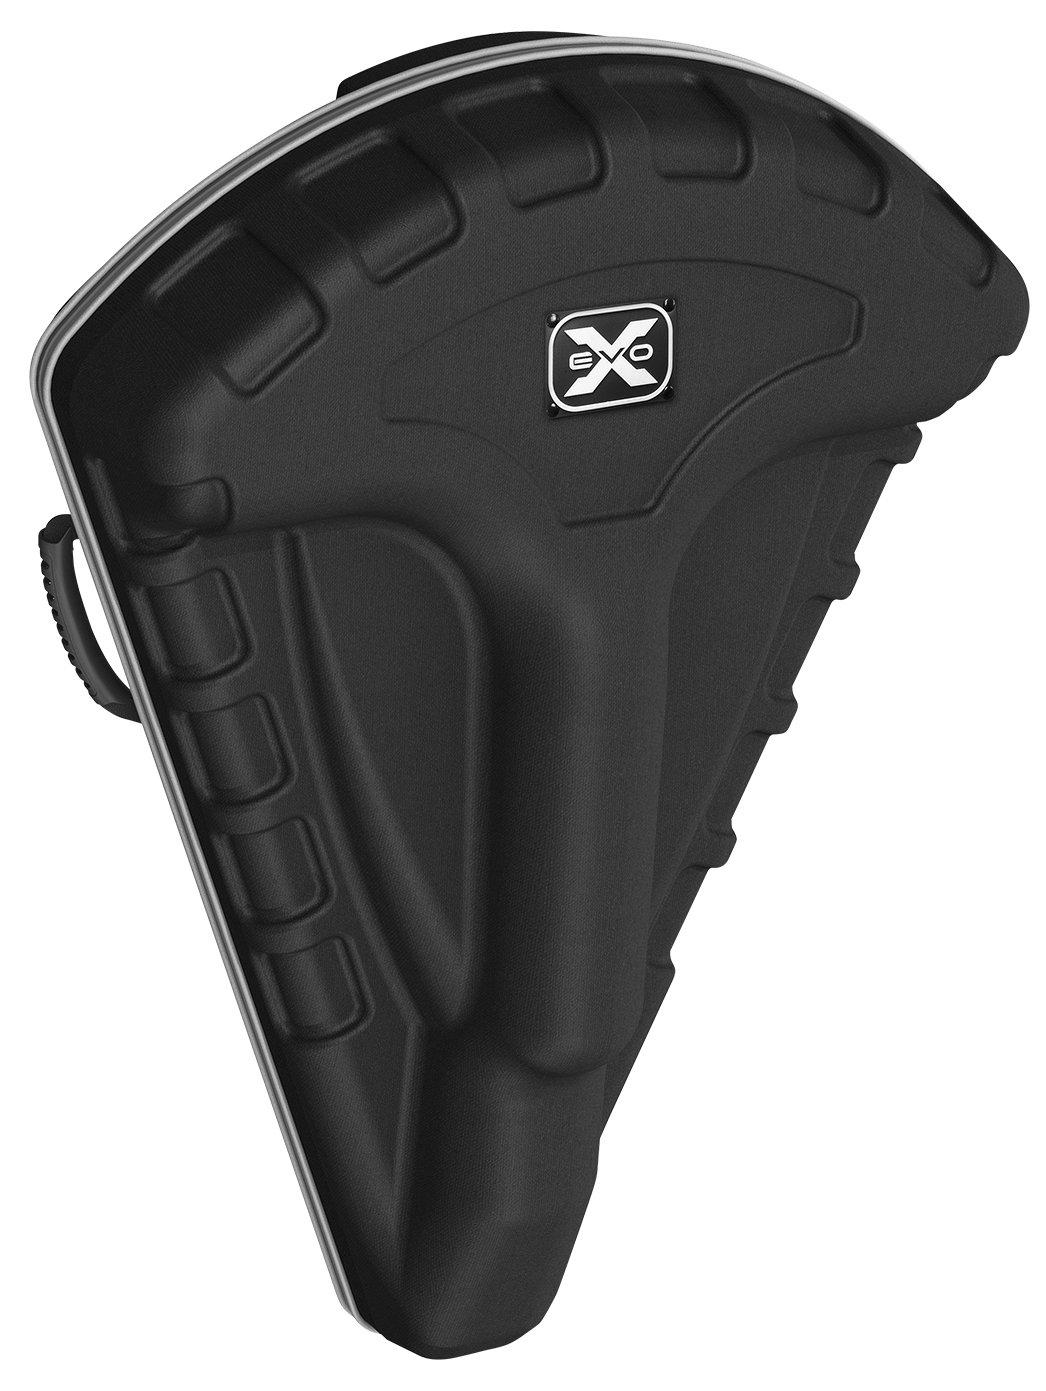 Tenpoint Evo-X Universal Hammerhead Hard Case